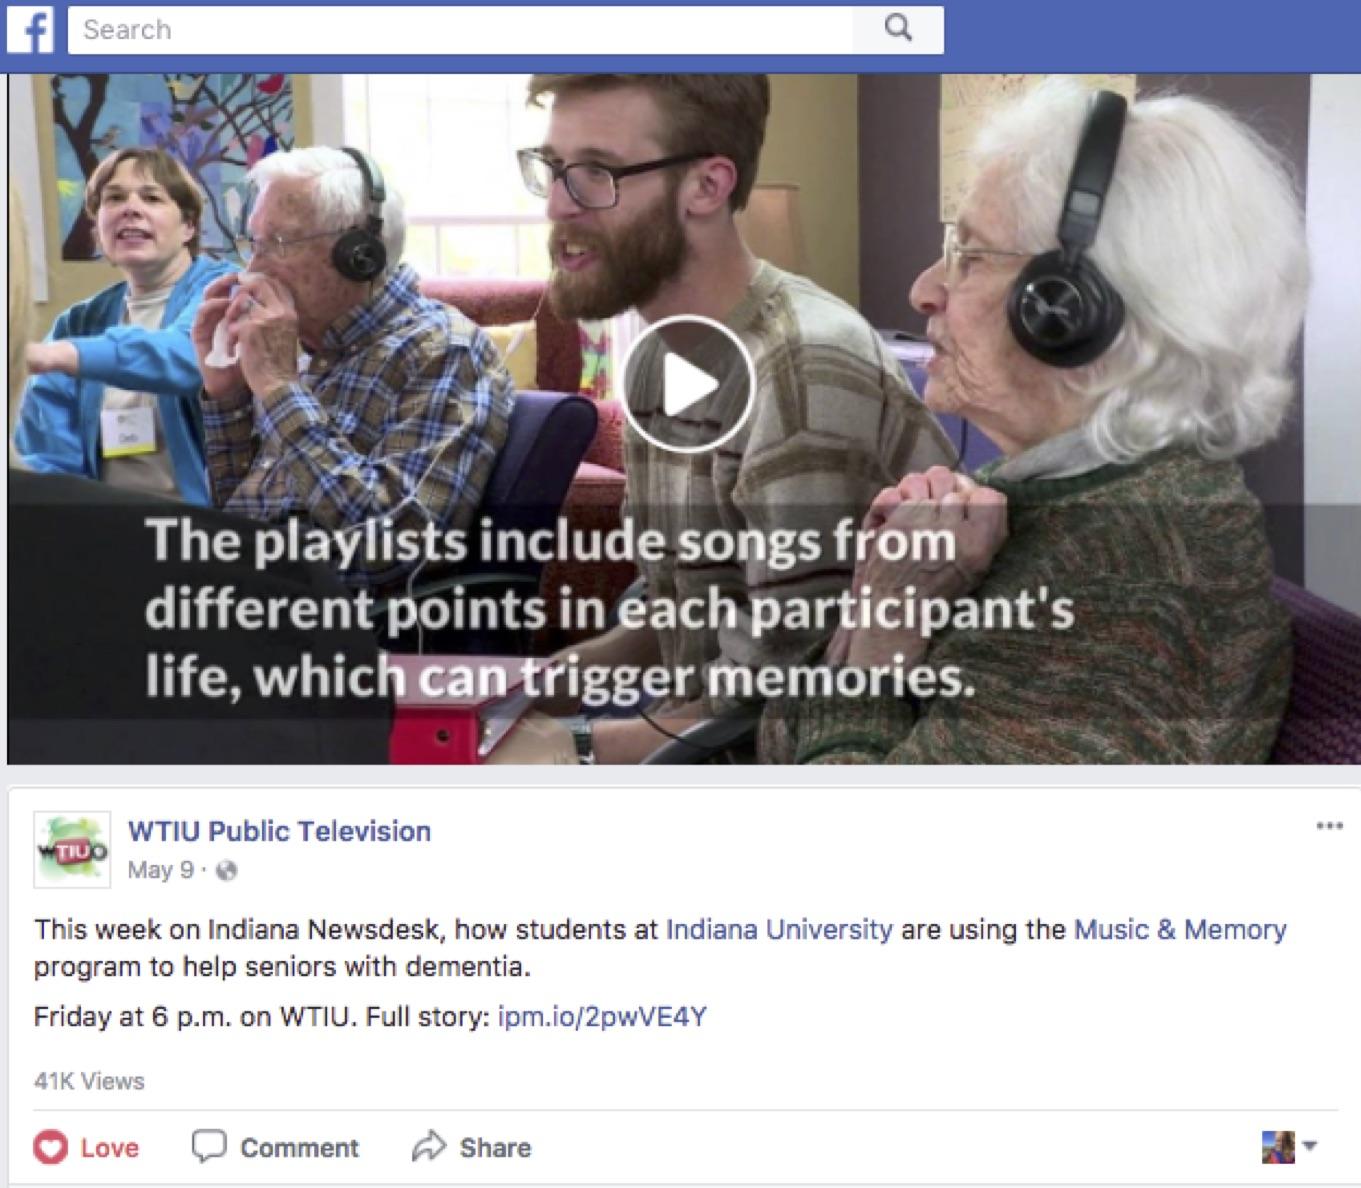 41,000 views on Facebook